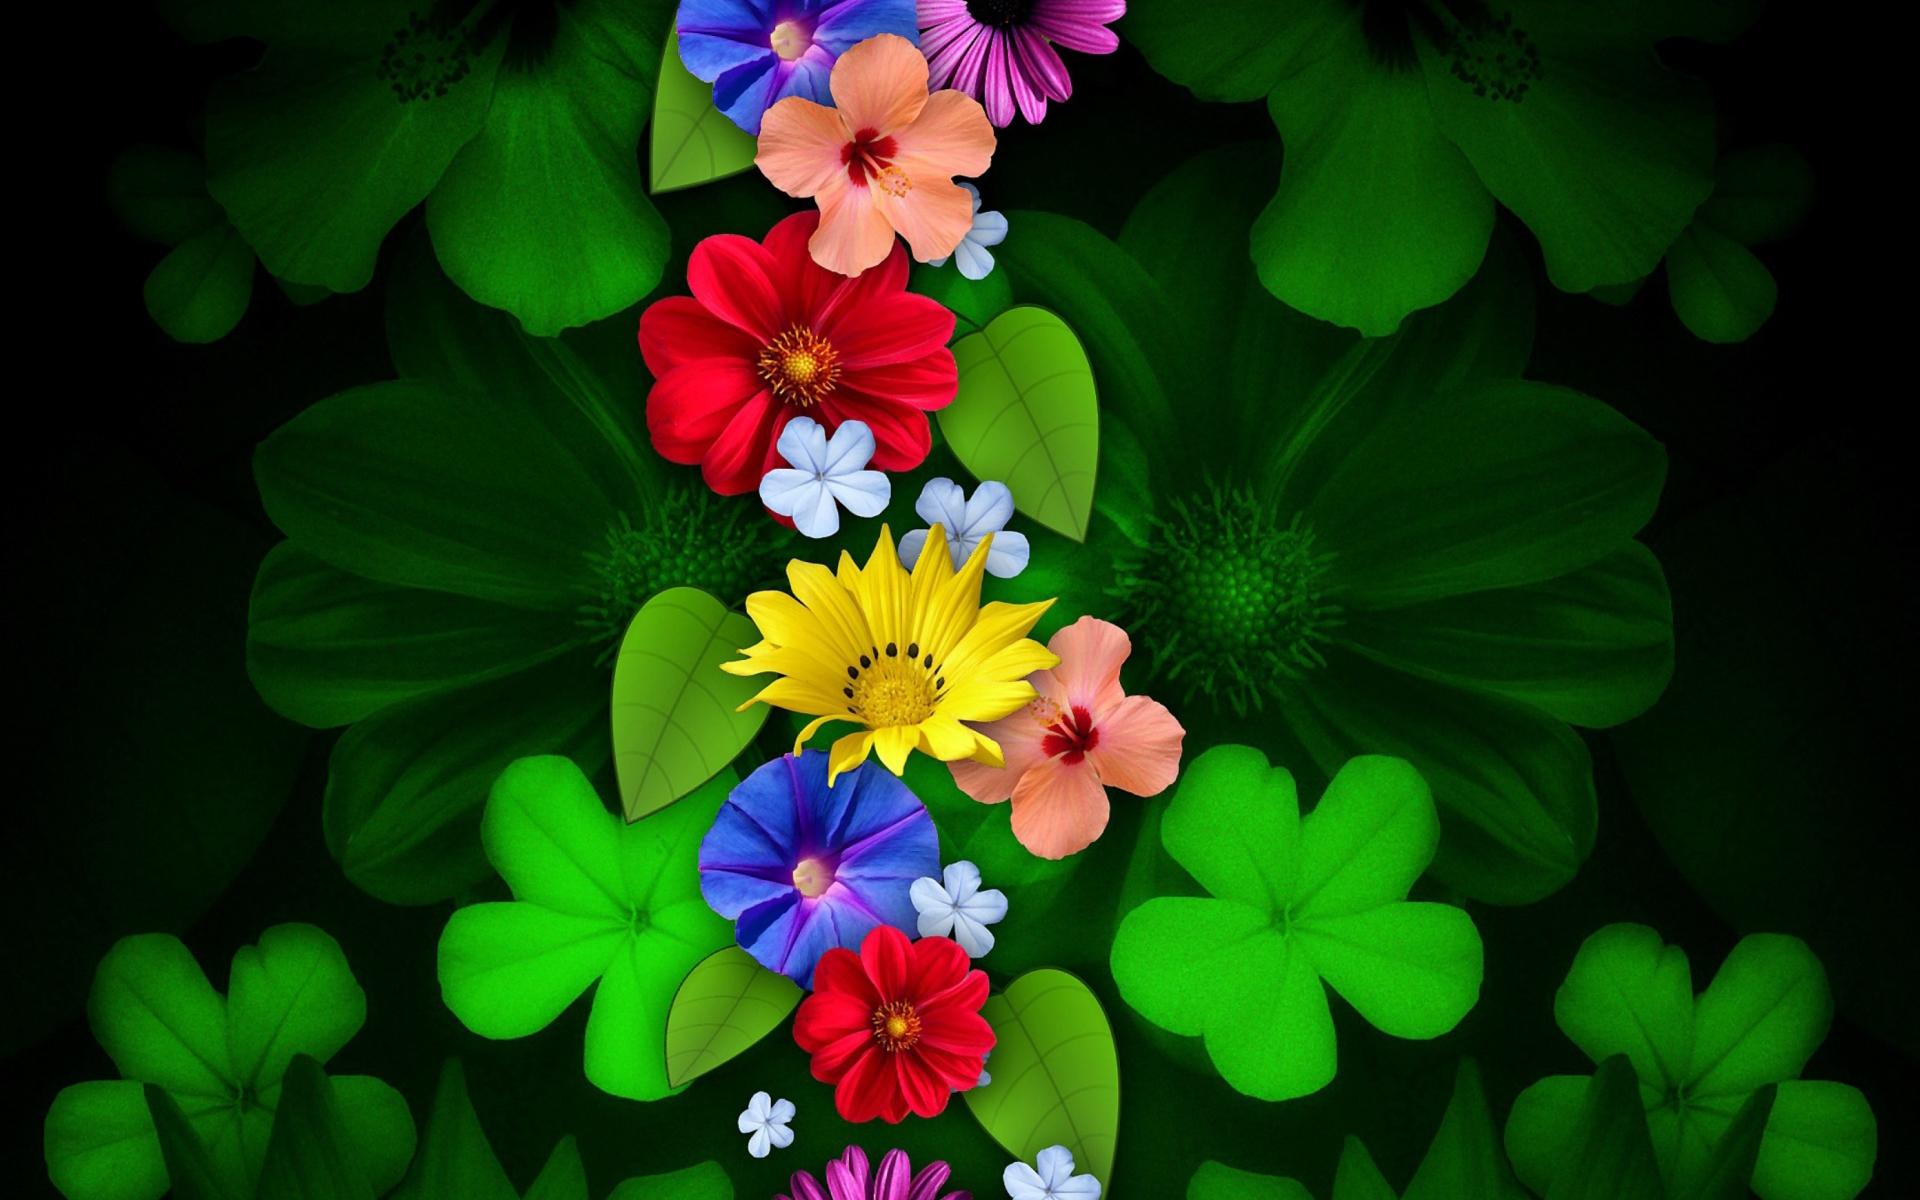 Spring Flowers Wallpaper Desktop Background For Widescreen